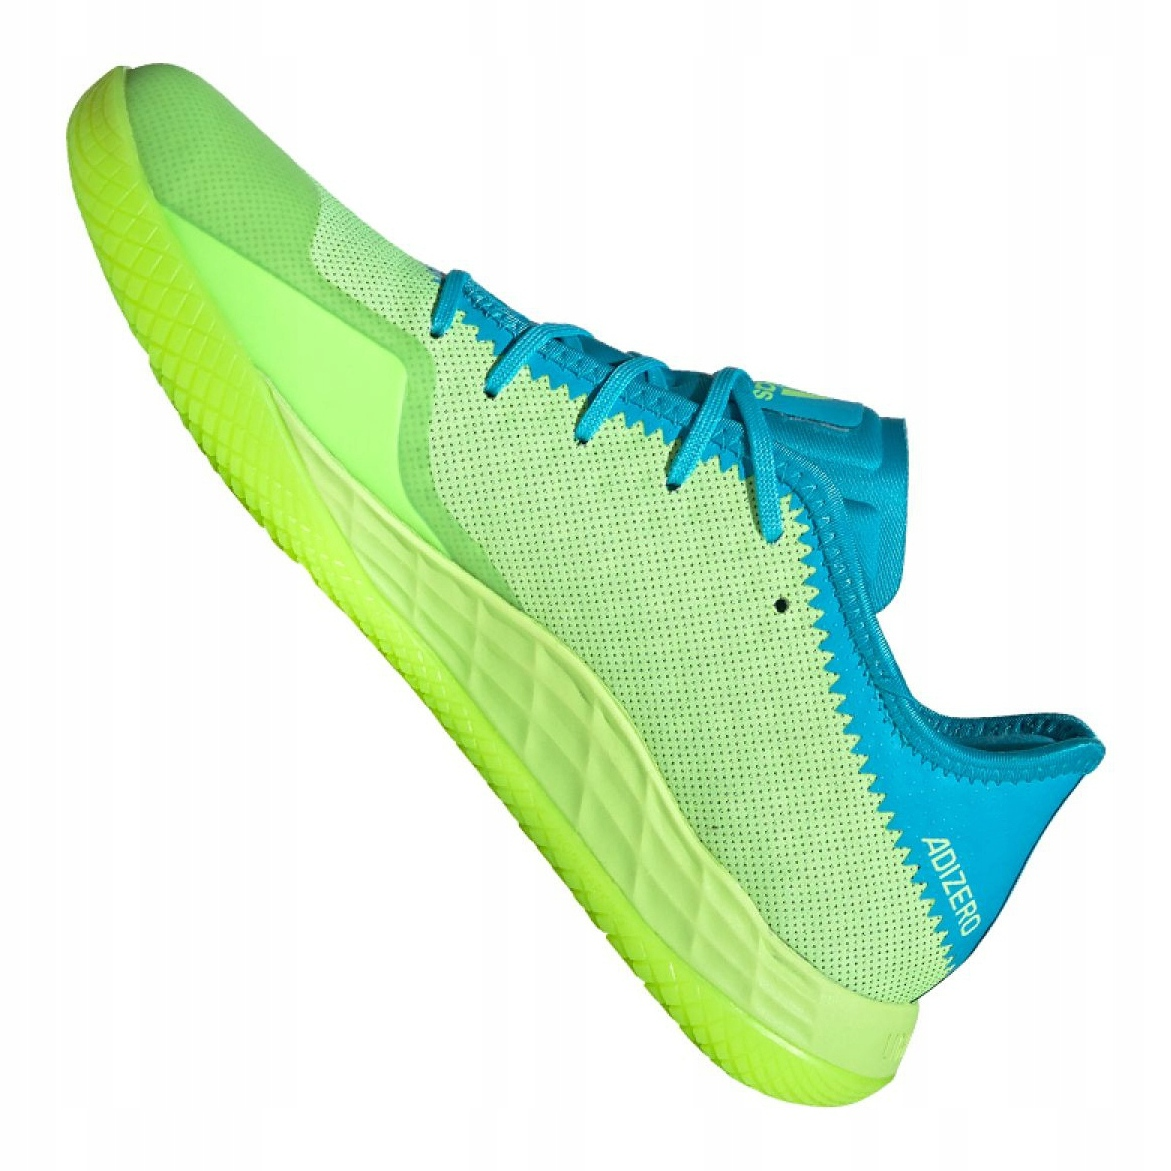 adidas adizero fast court